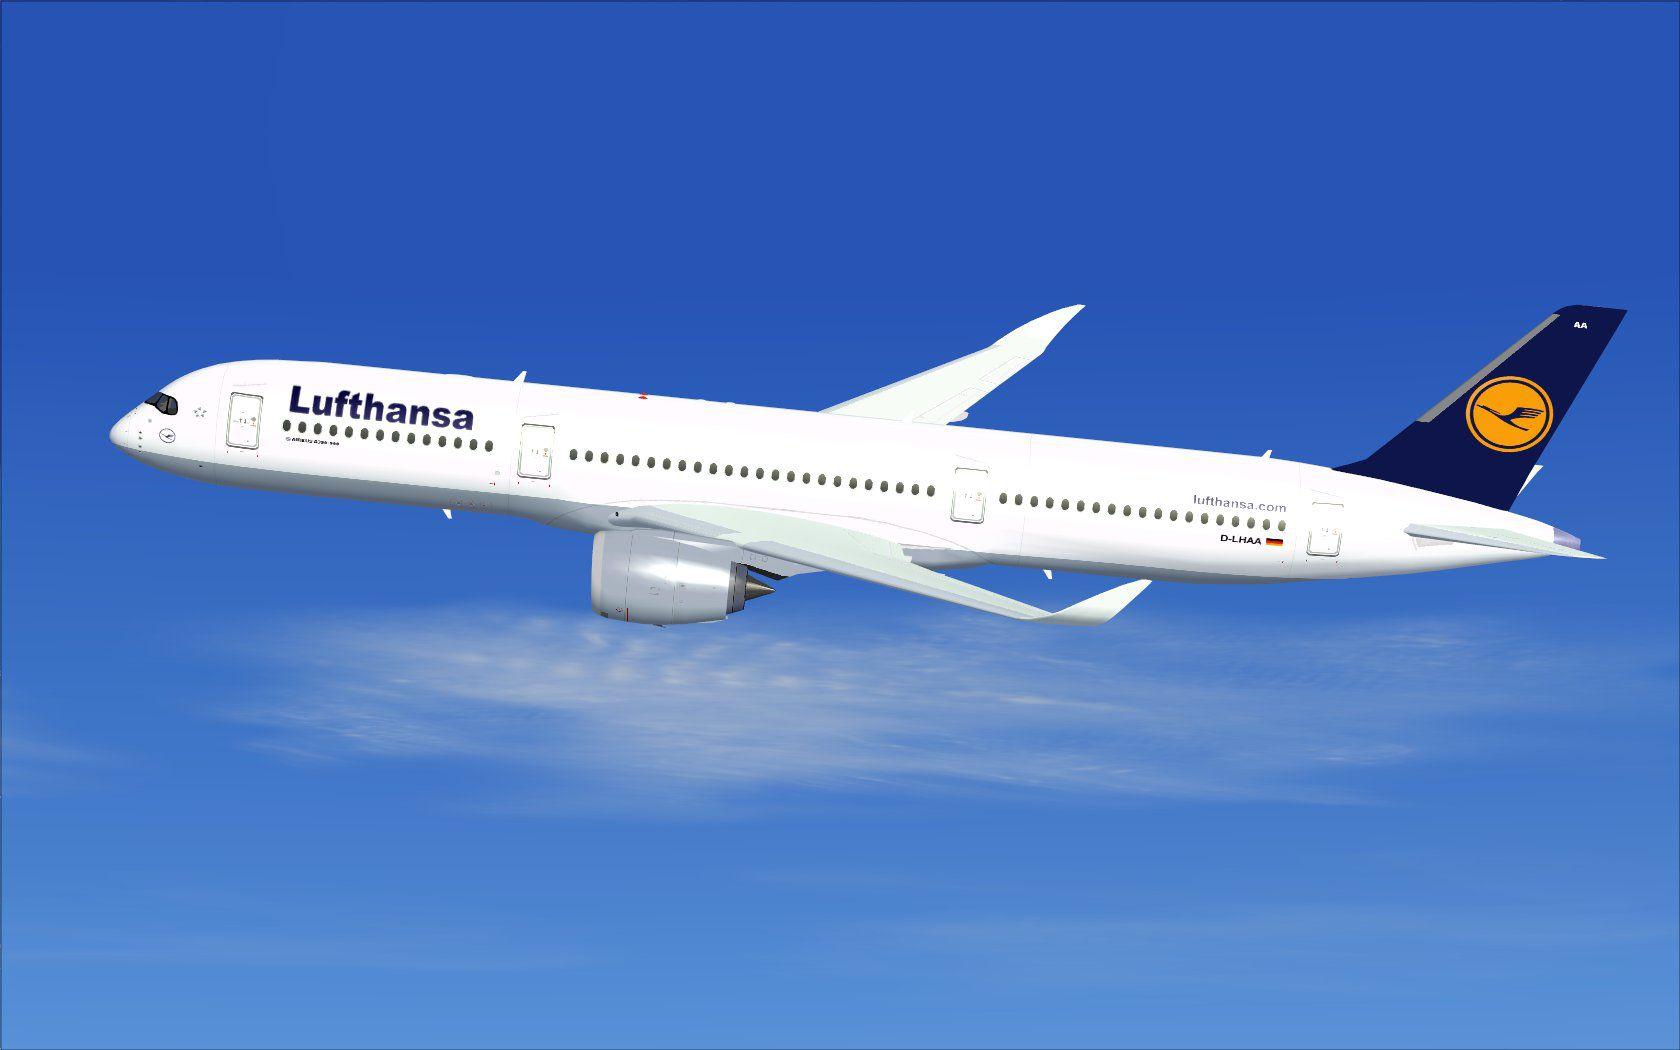 Lufthansa Airbus A350-900 XWB (simulation)